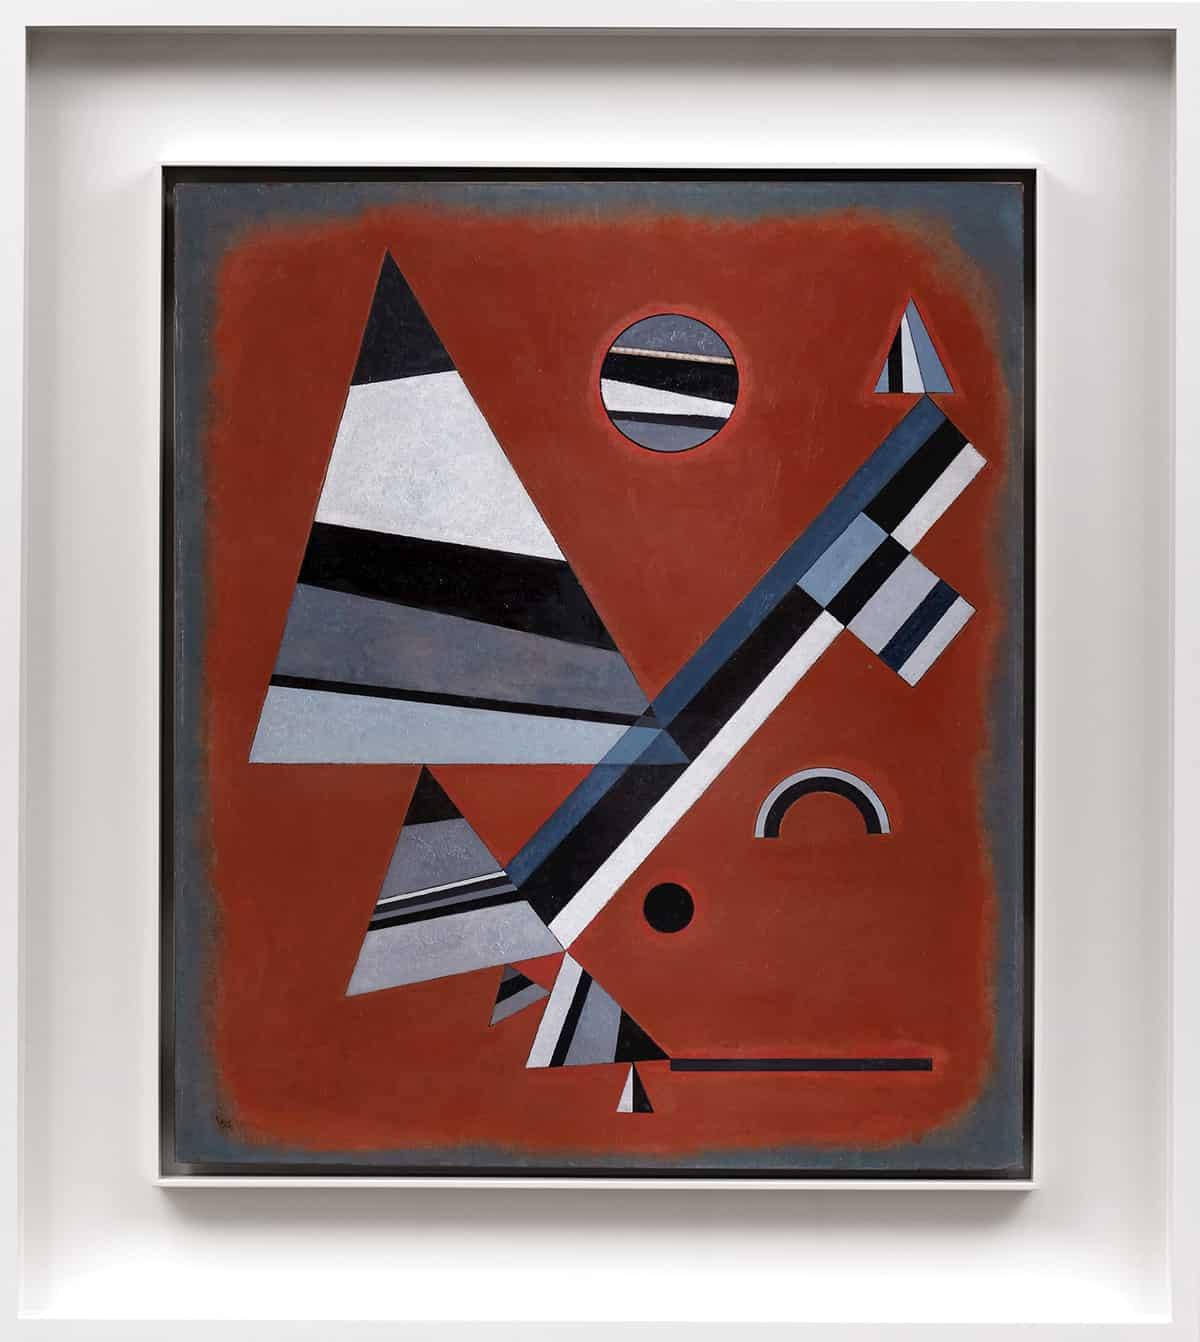 Wassily Kandinsky, Grau, 1931 at Ben Brown Fine Arts